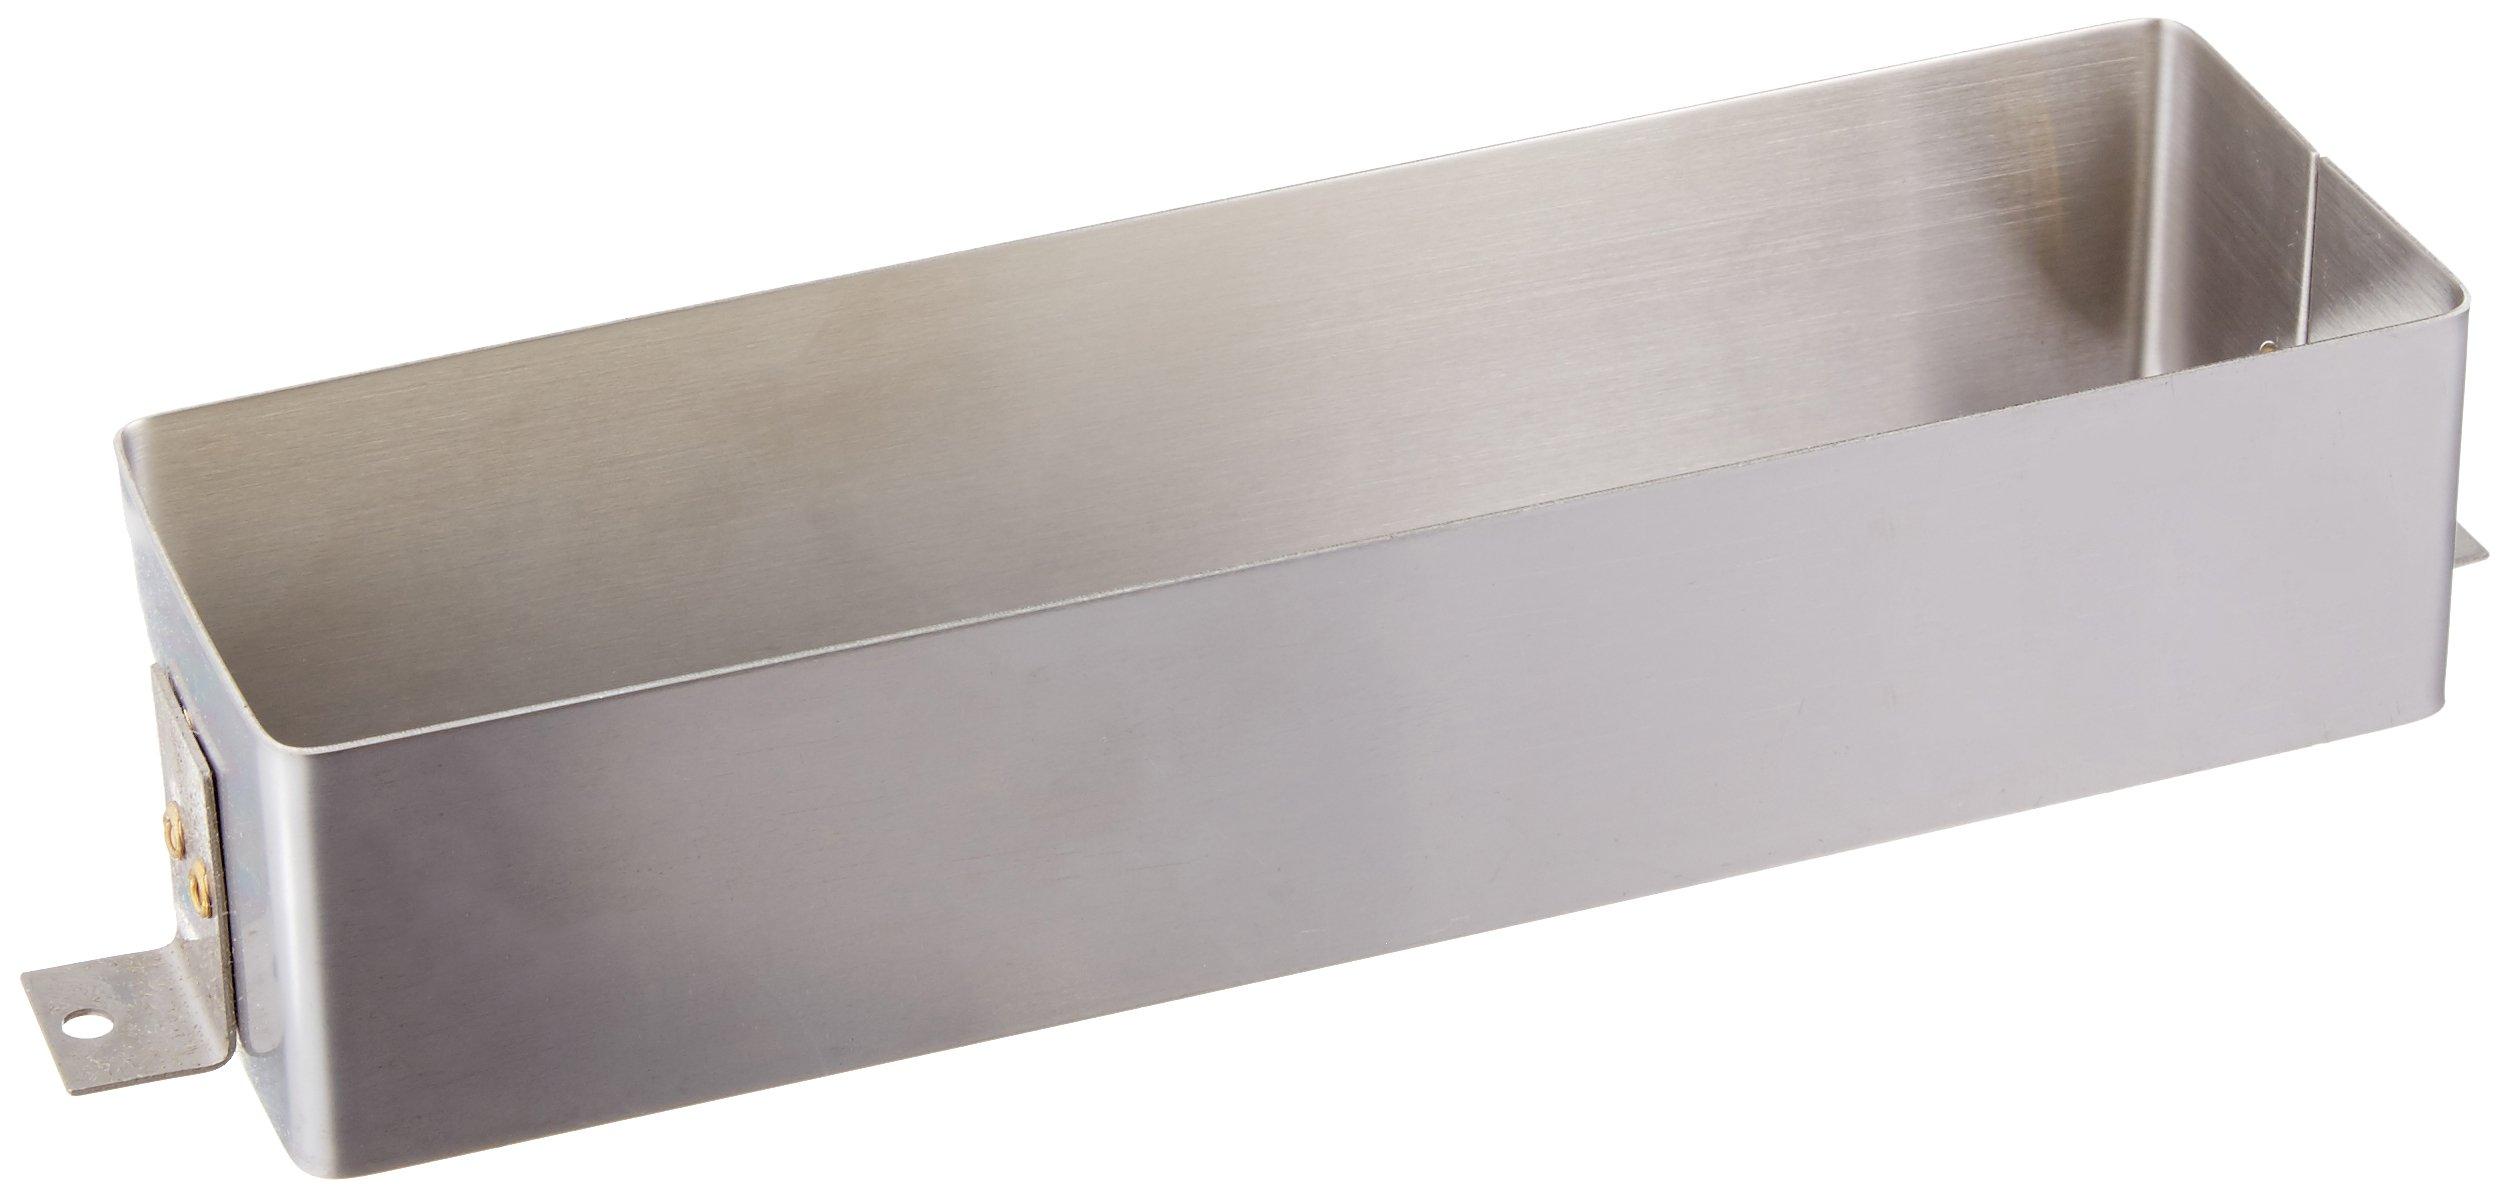 Baldwin 0050.324 Letter Box Sleeve, Satin Stainless Steel